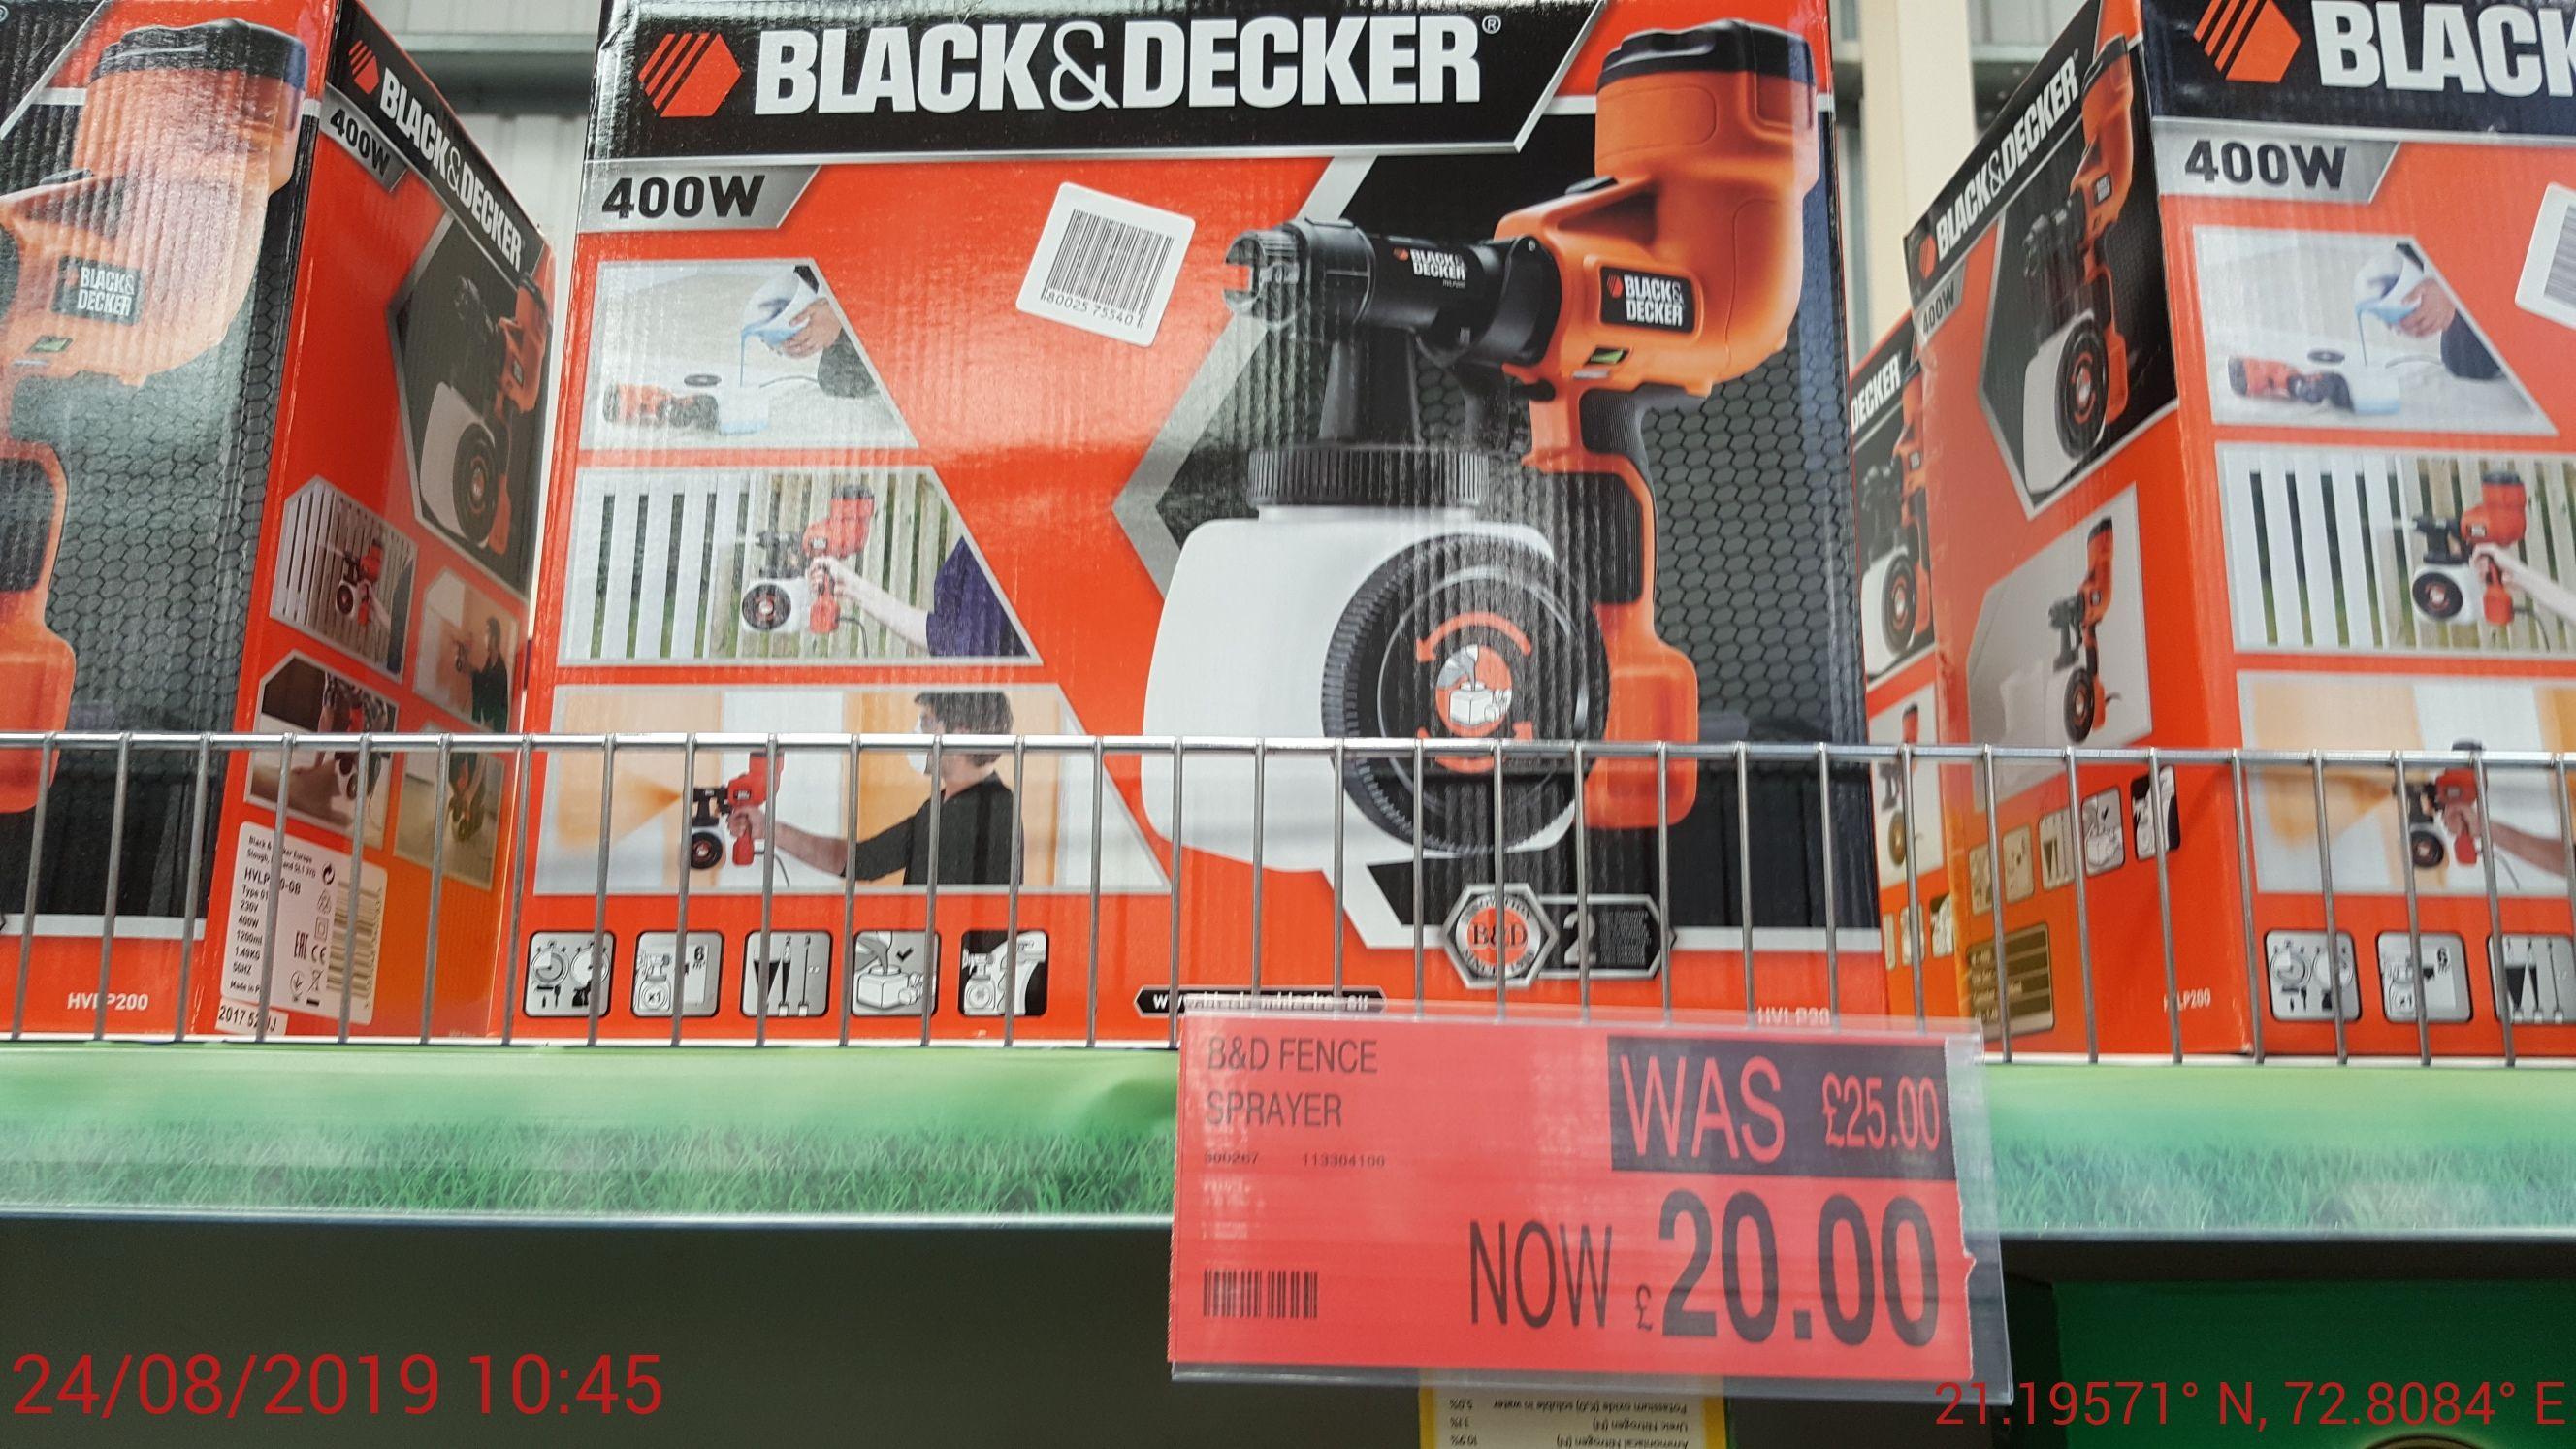 Black and decker sprayer - £20 @ B&M (Corby)